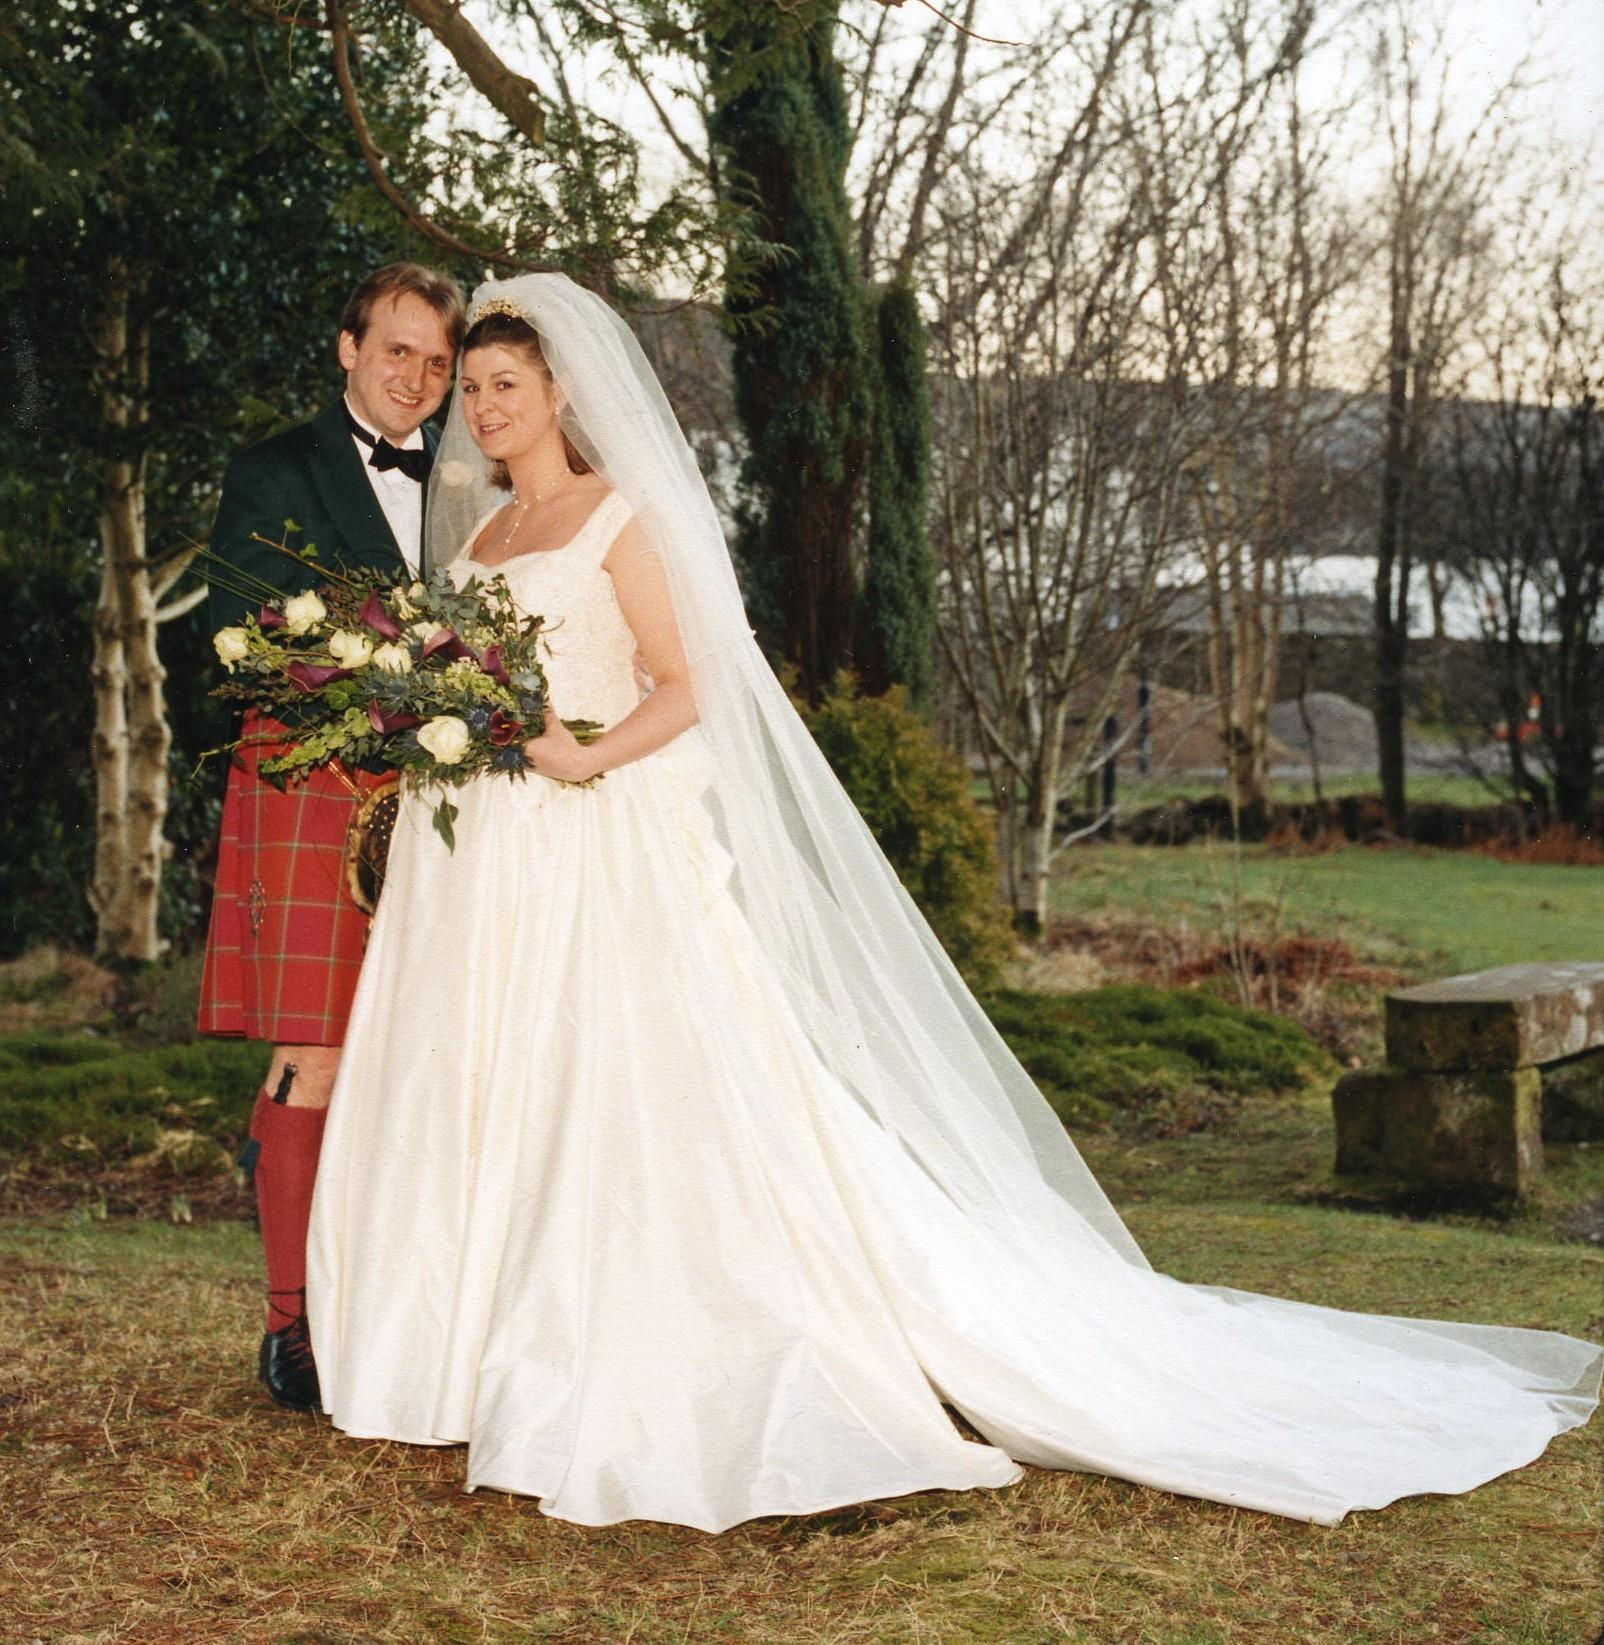 James Delap & Lucy MacIntosh's Wedding